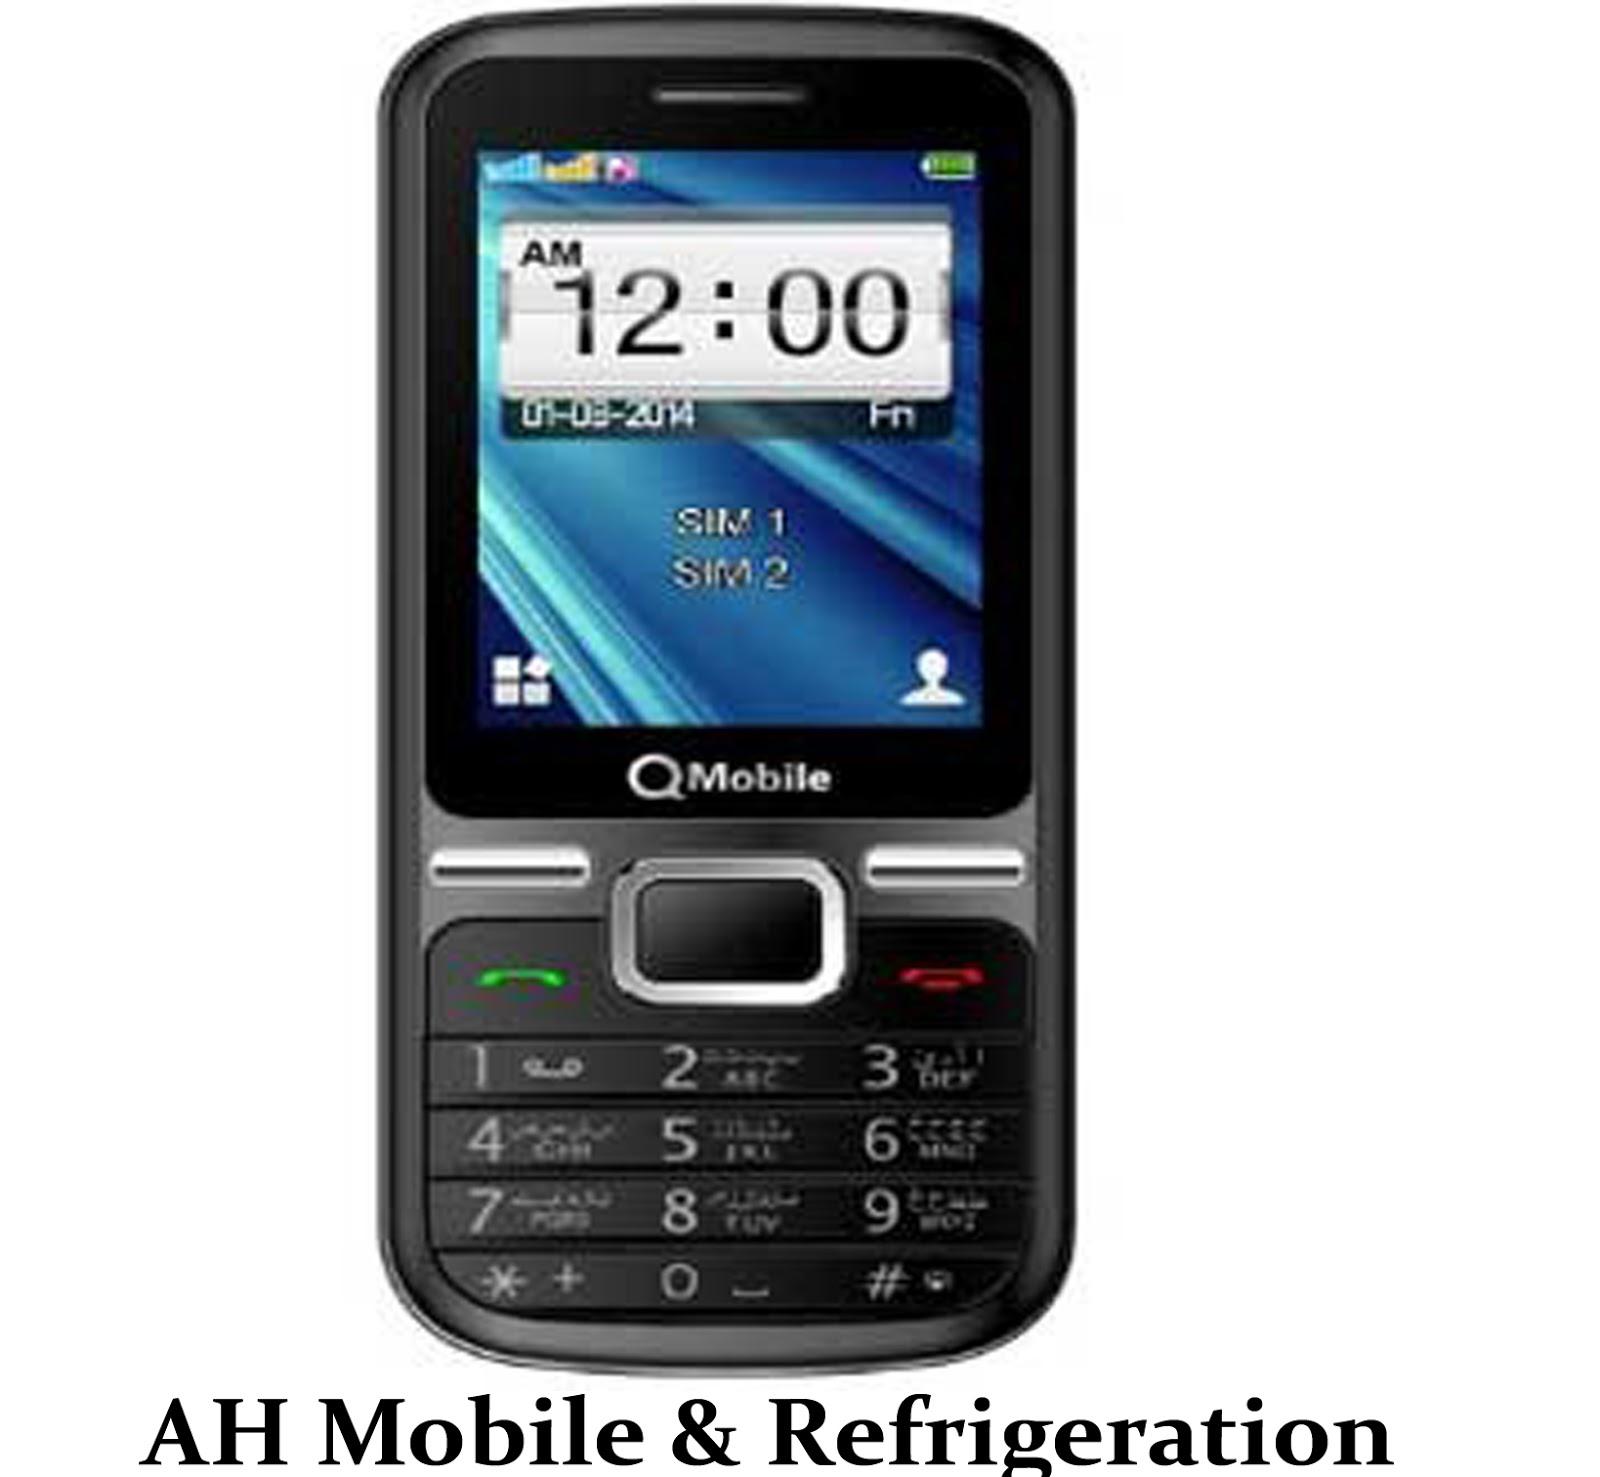 QMobile R220 MTK6261DA Flash File 100% ok File - AH Mobile